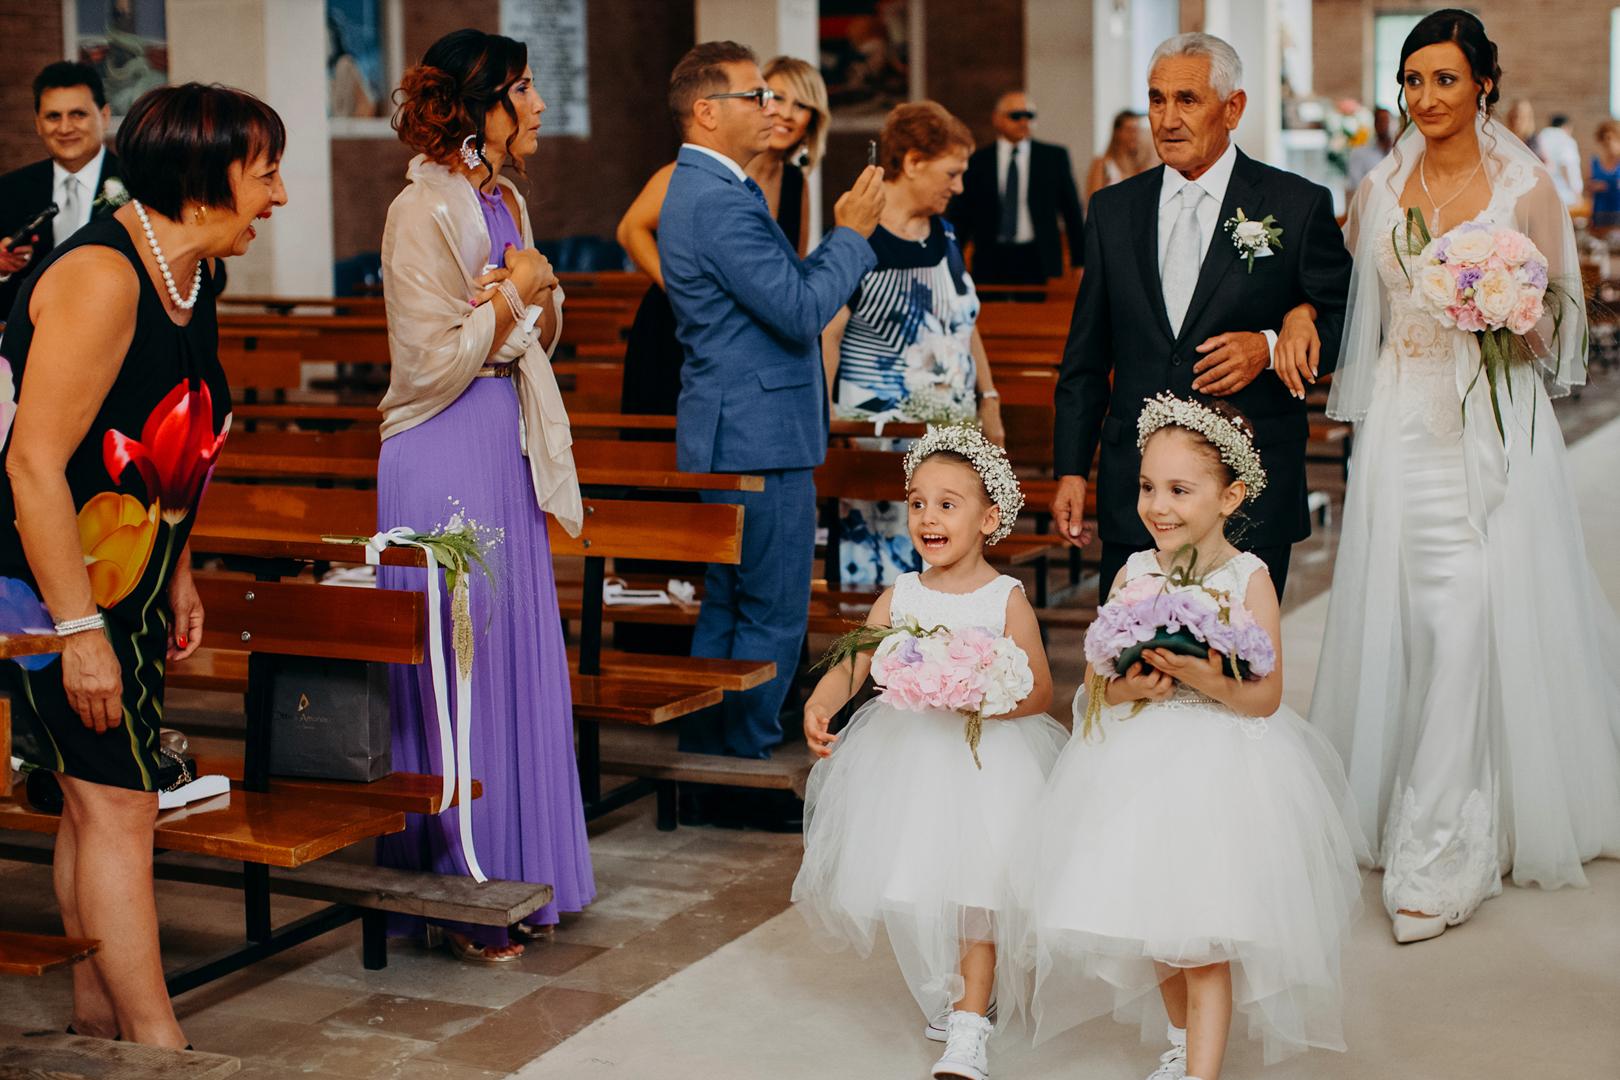 10 gianni-lepore-fotografo-matrimonio-sansevero-entrata-chiesa-church